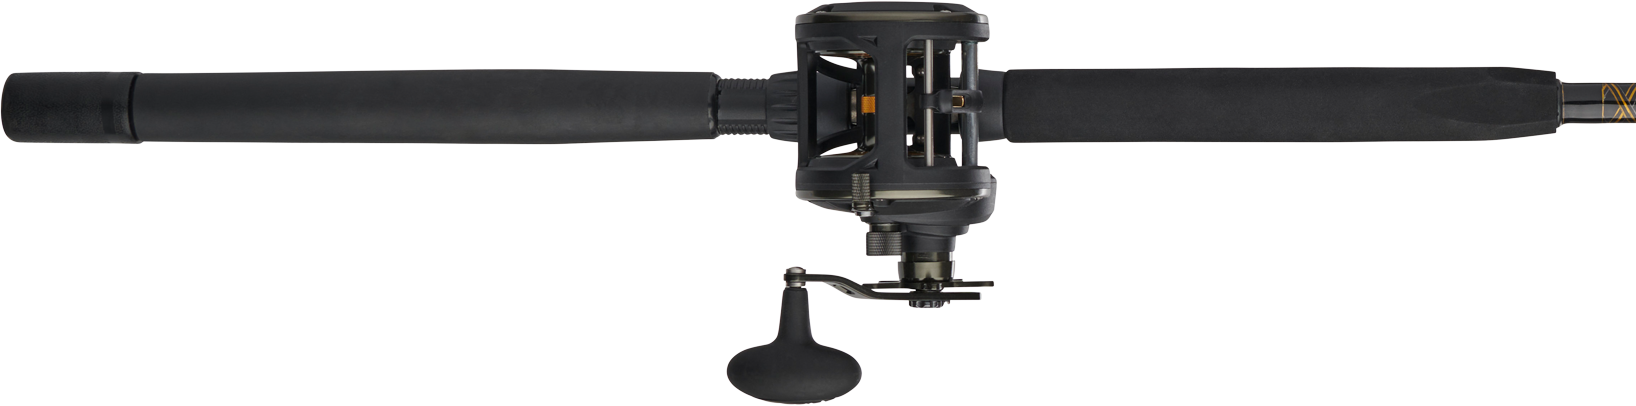 Penn Squall II rod and reel combo